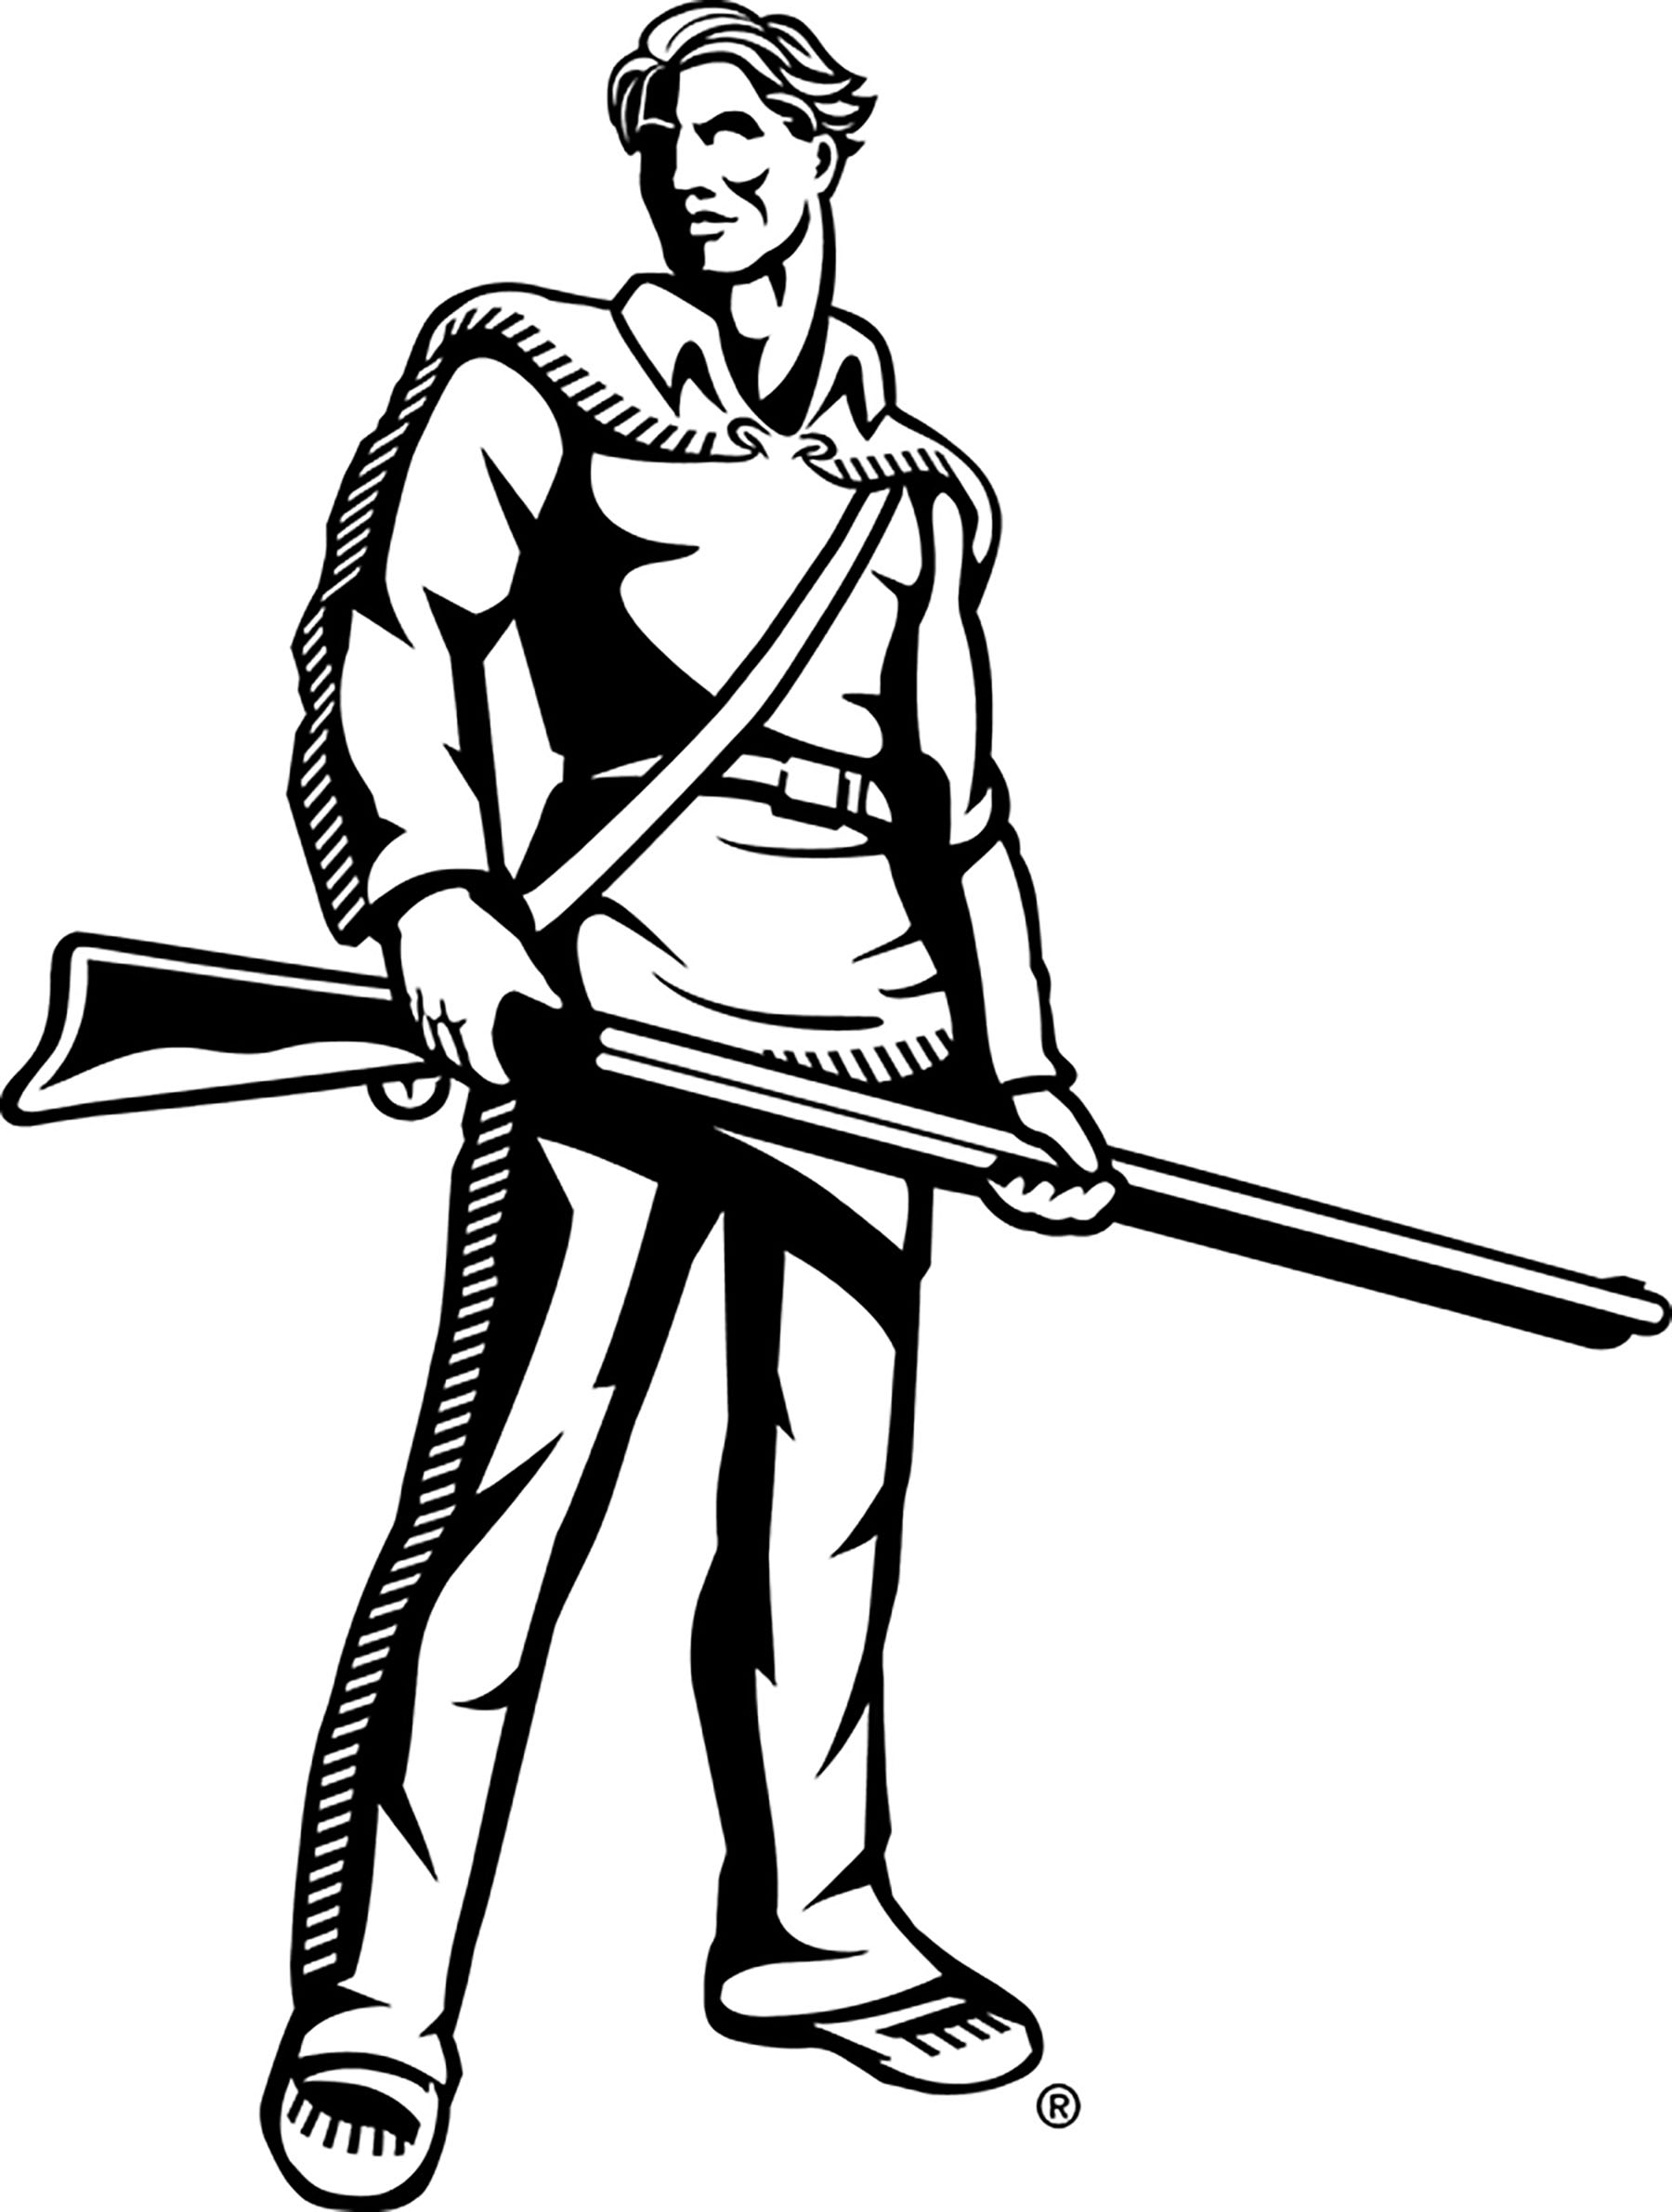 Mountaineer Mascot Clipart.